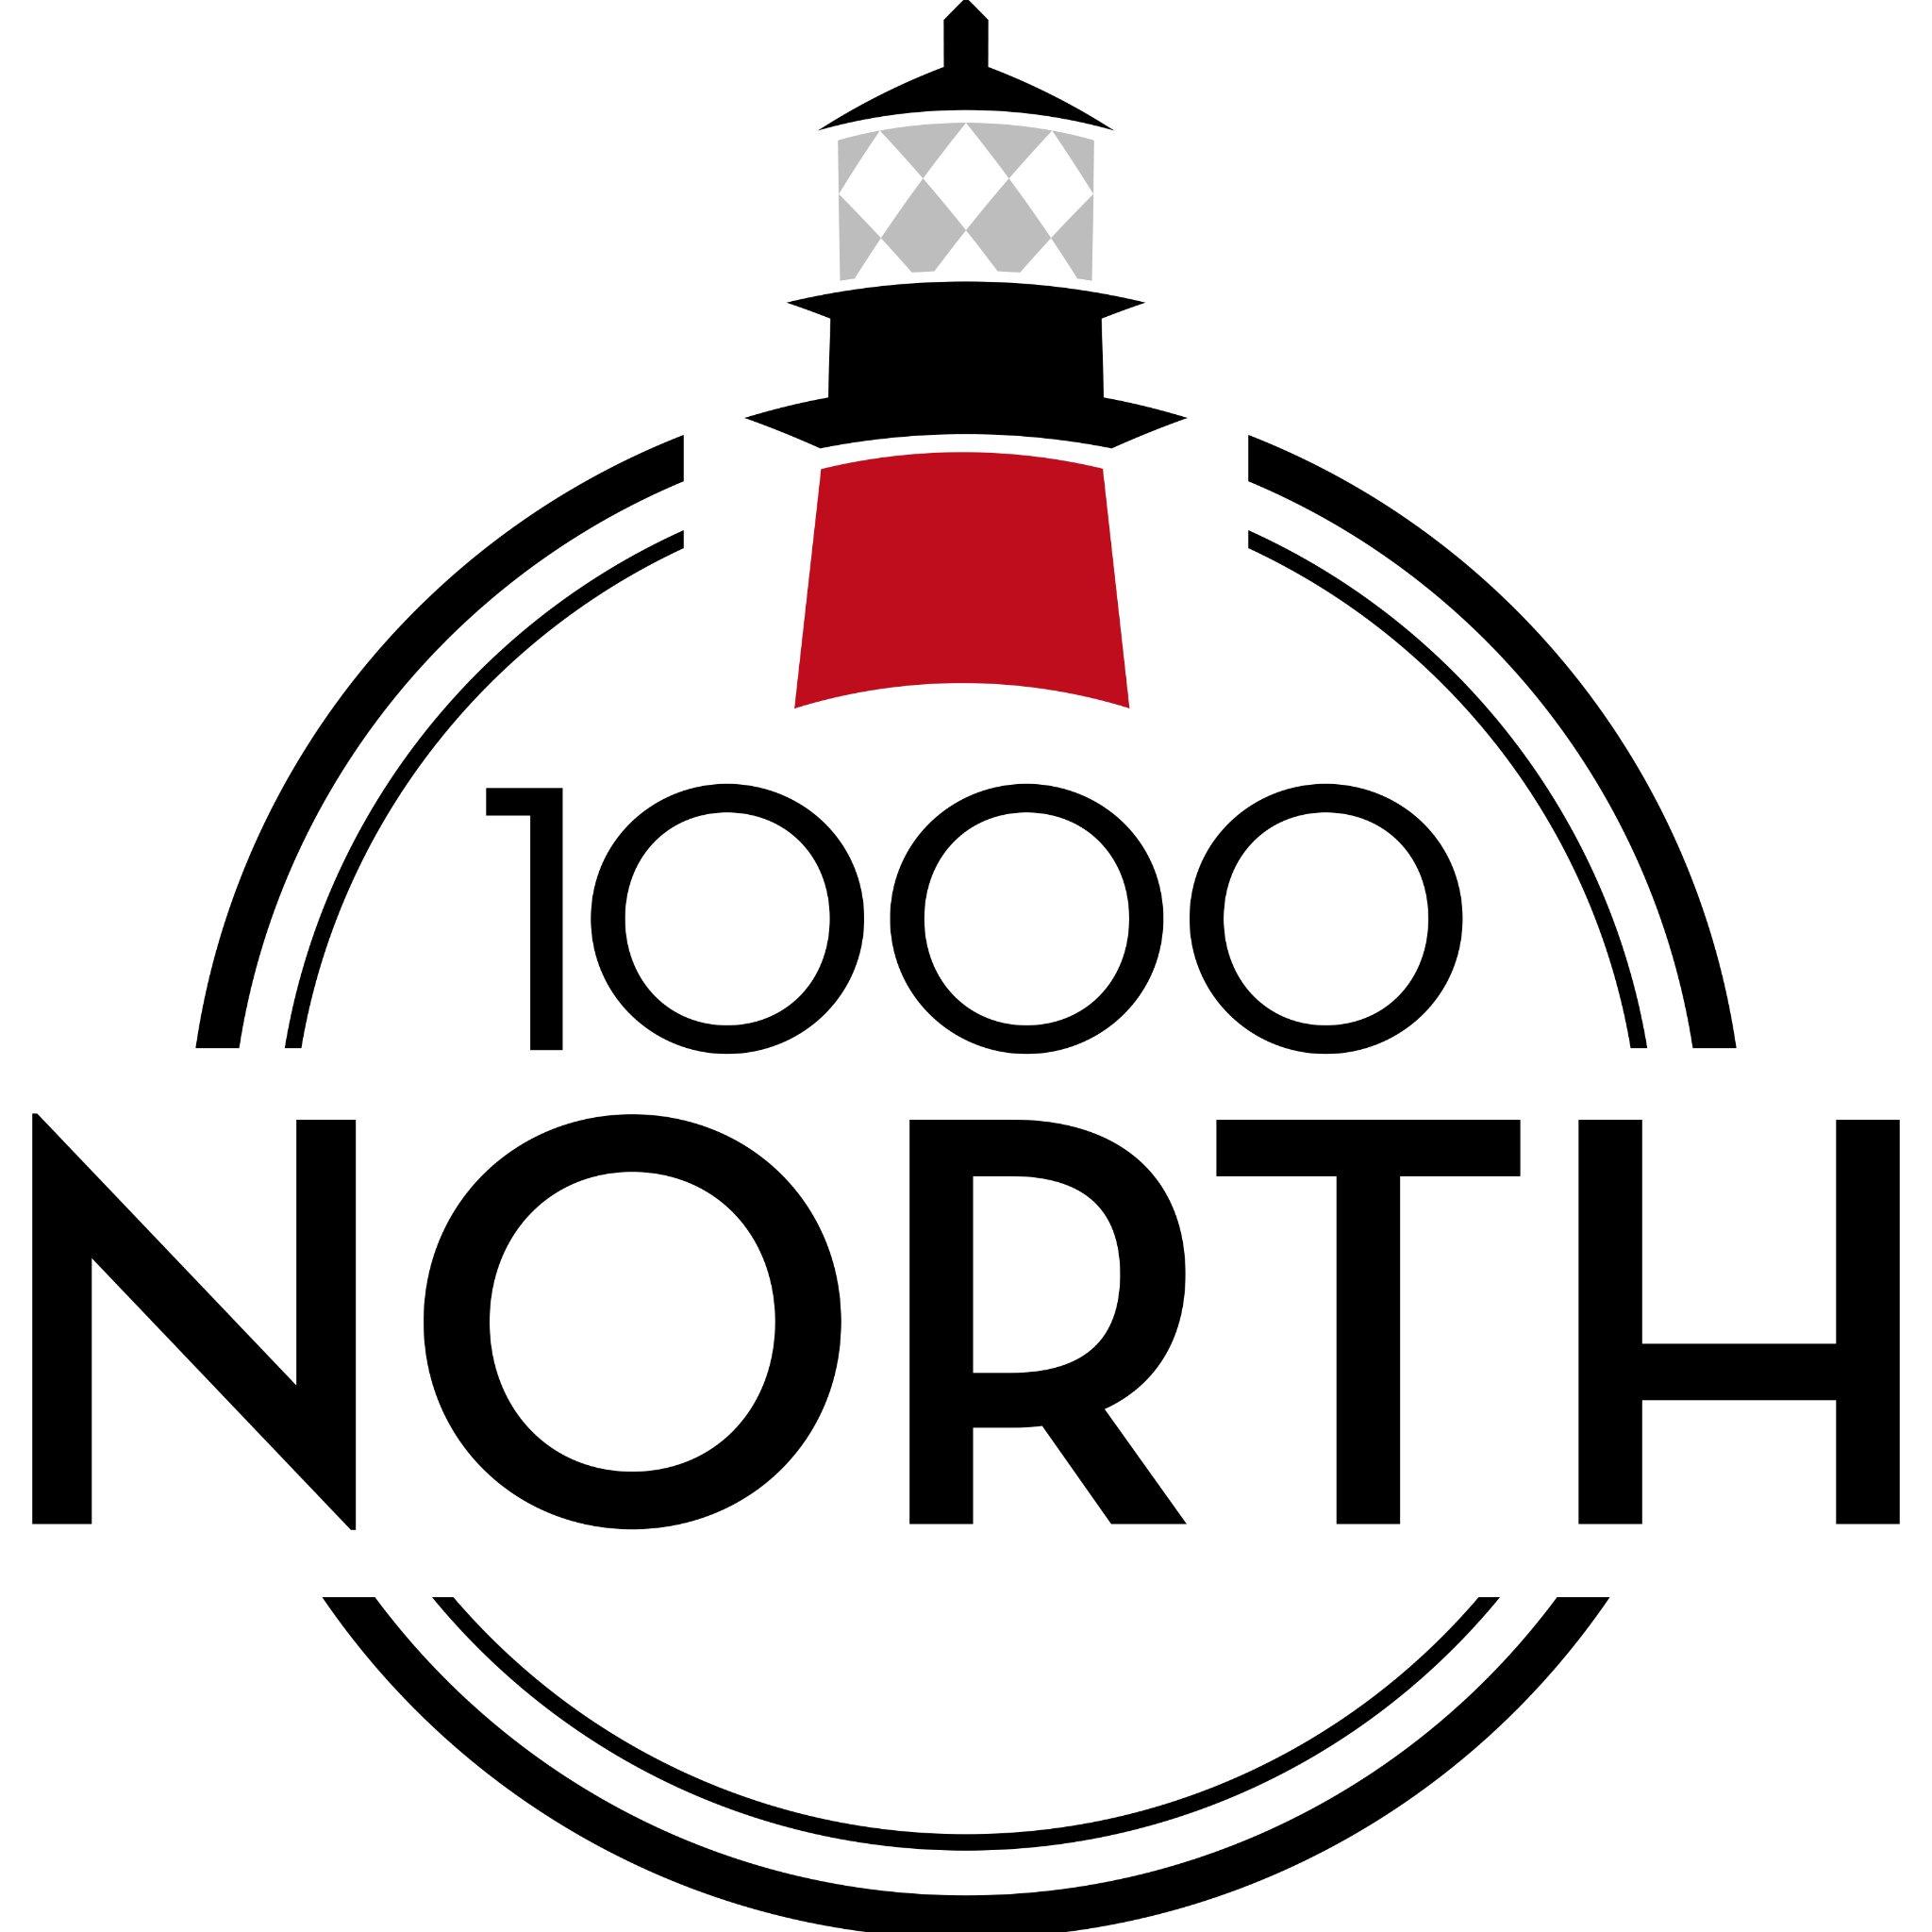 Image result for 1000 north logo